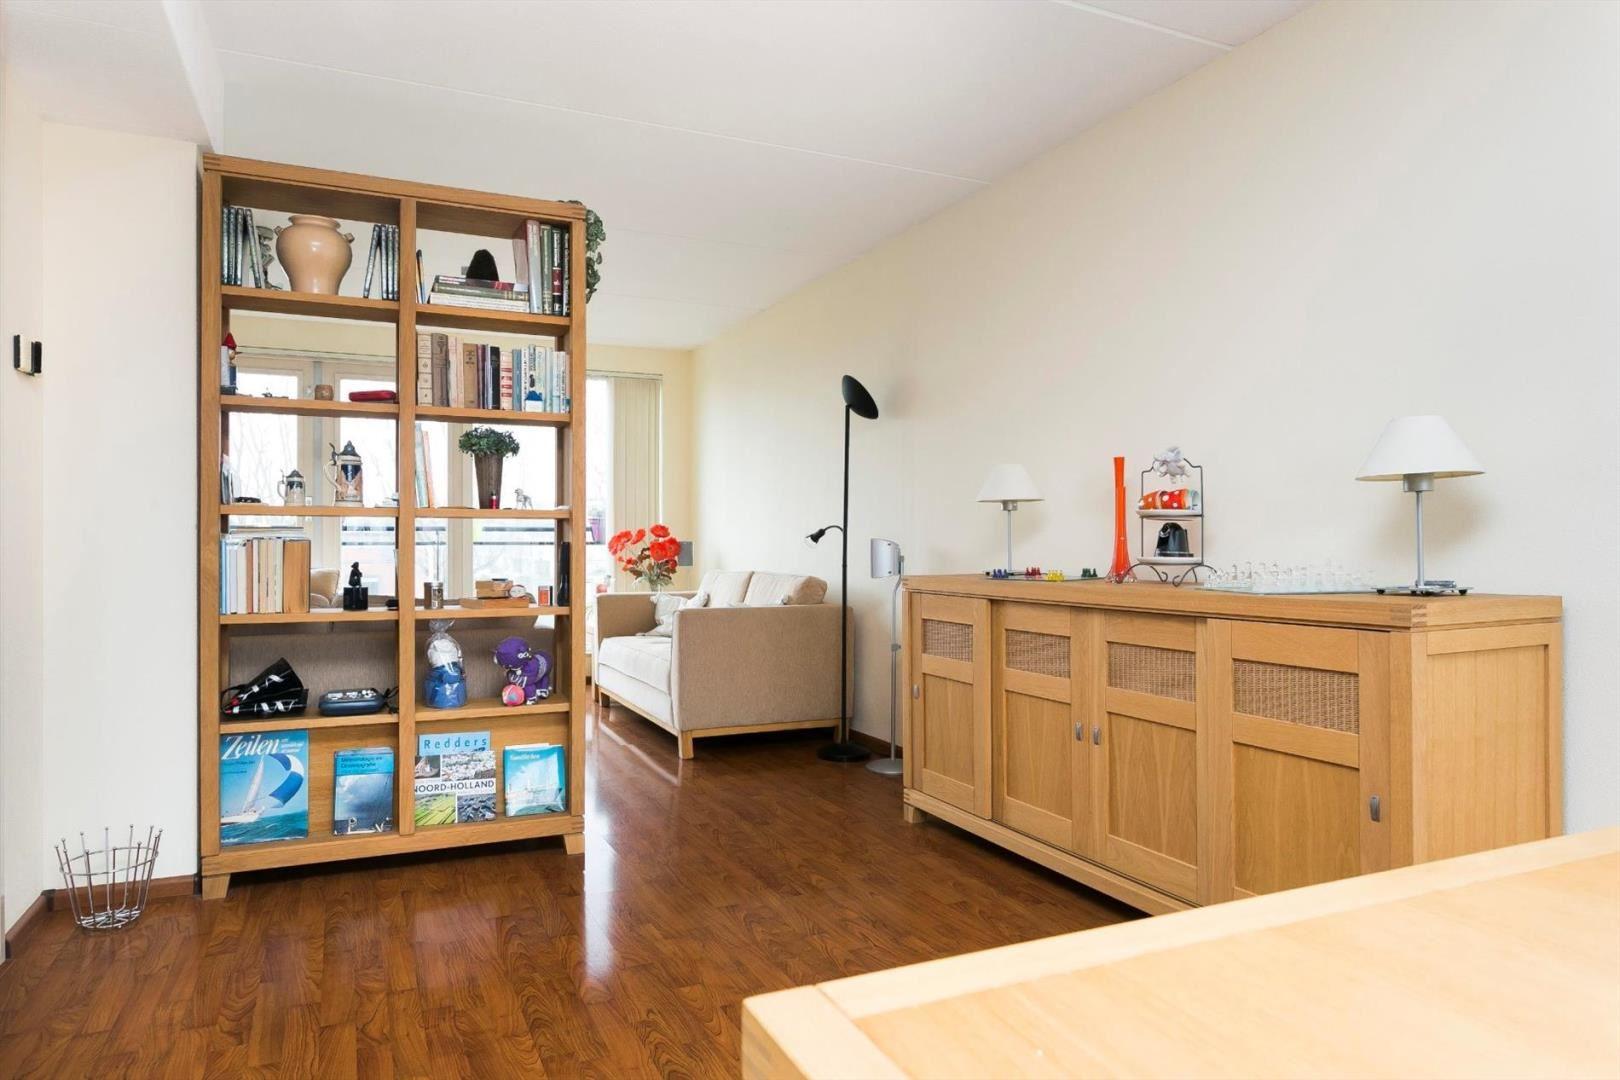 Huis te koop bertus aafjeshof 171 1628 vv hoorn nh funda - Huis vv ...